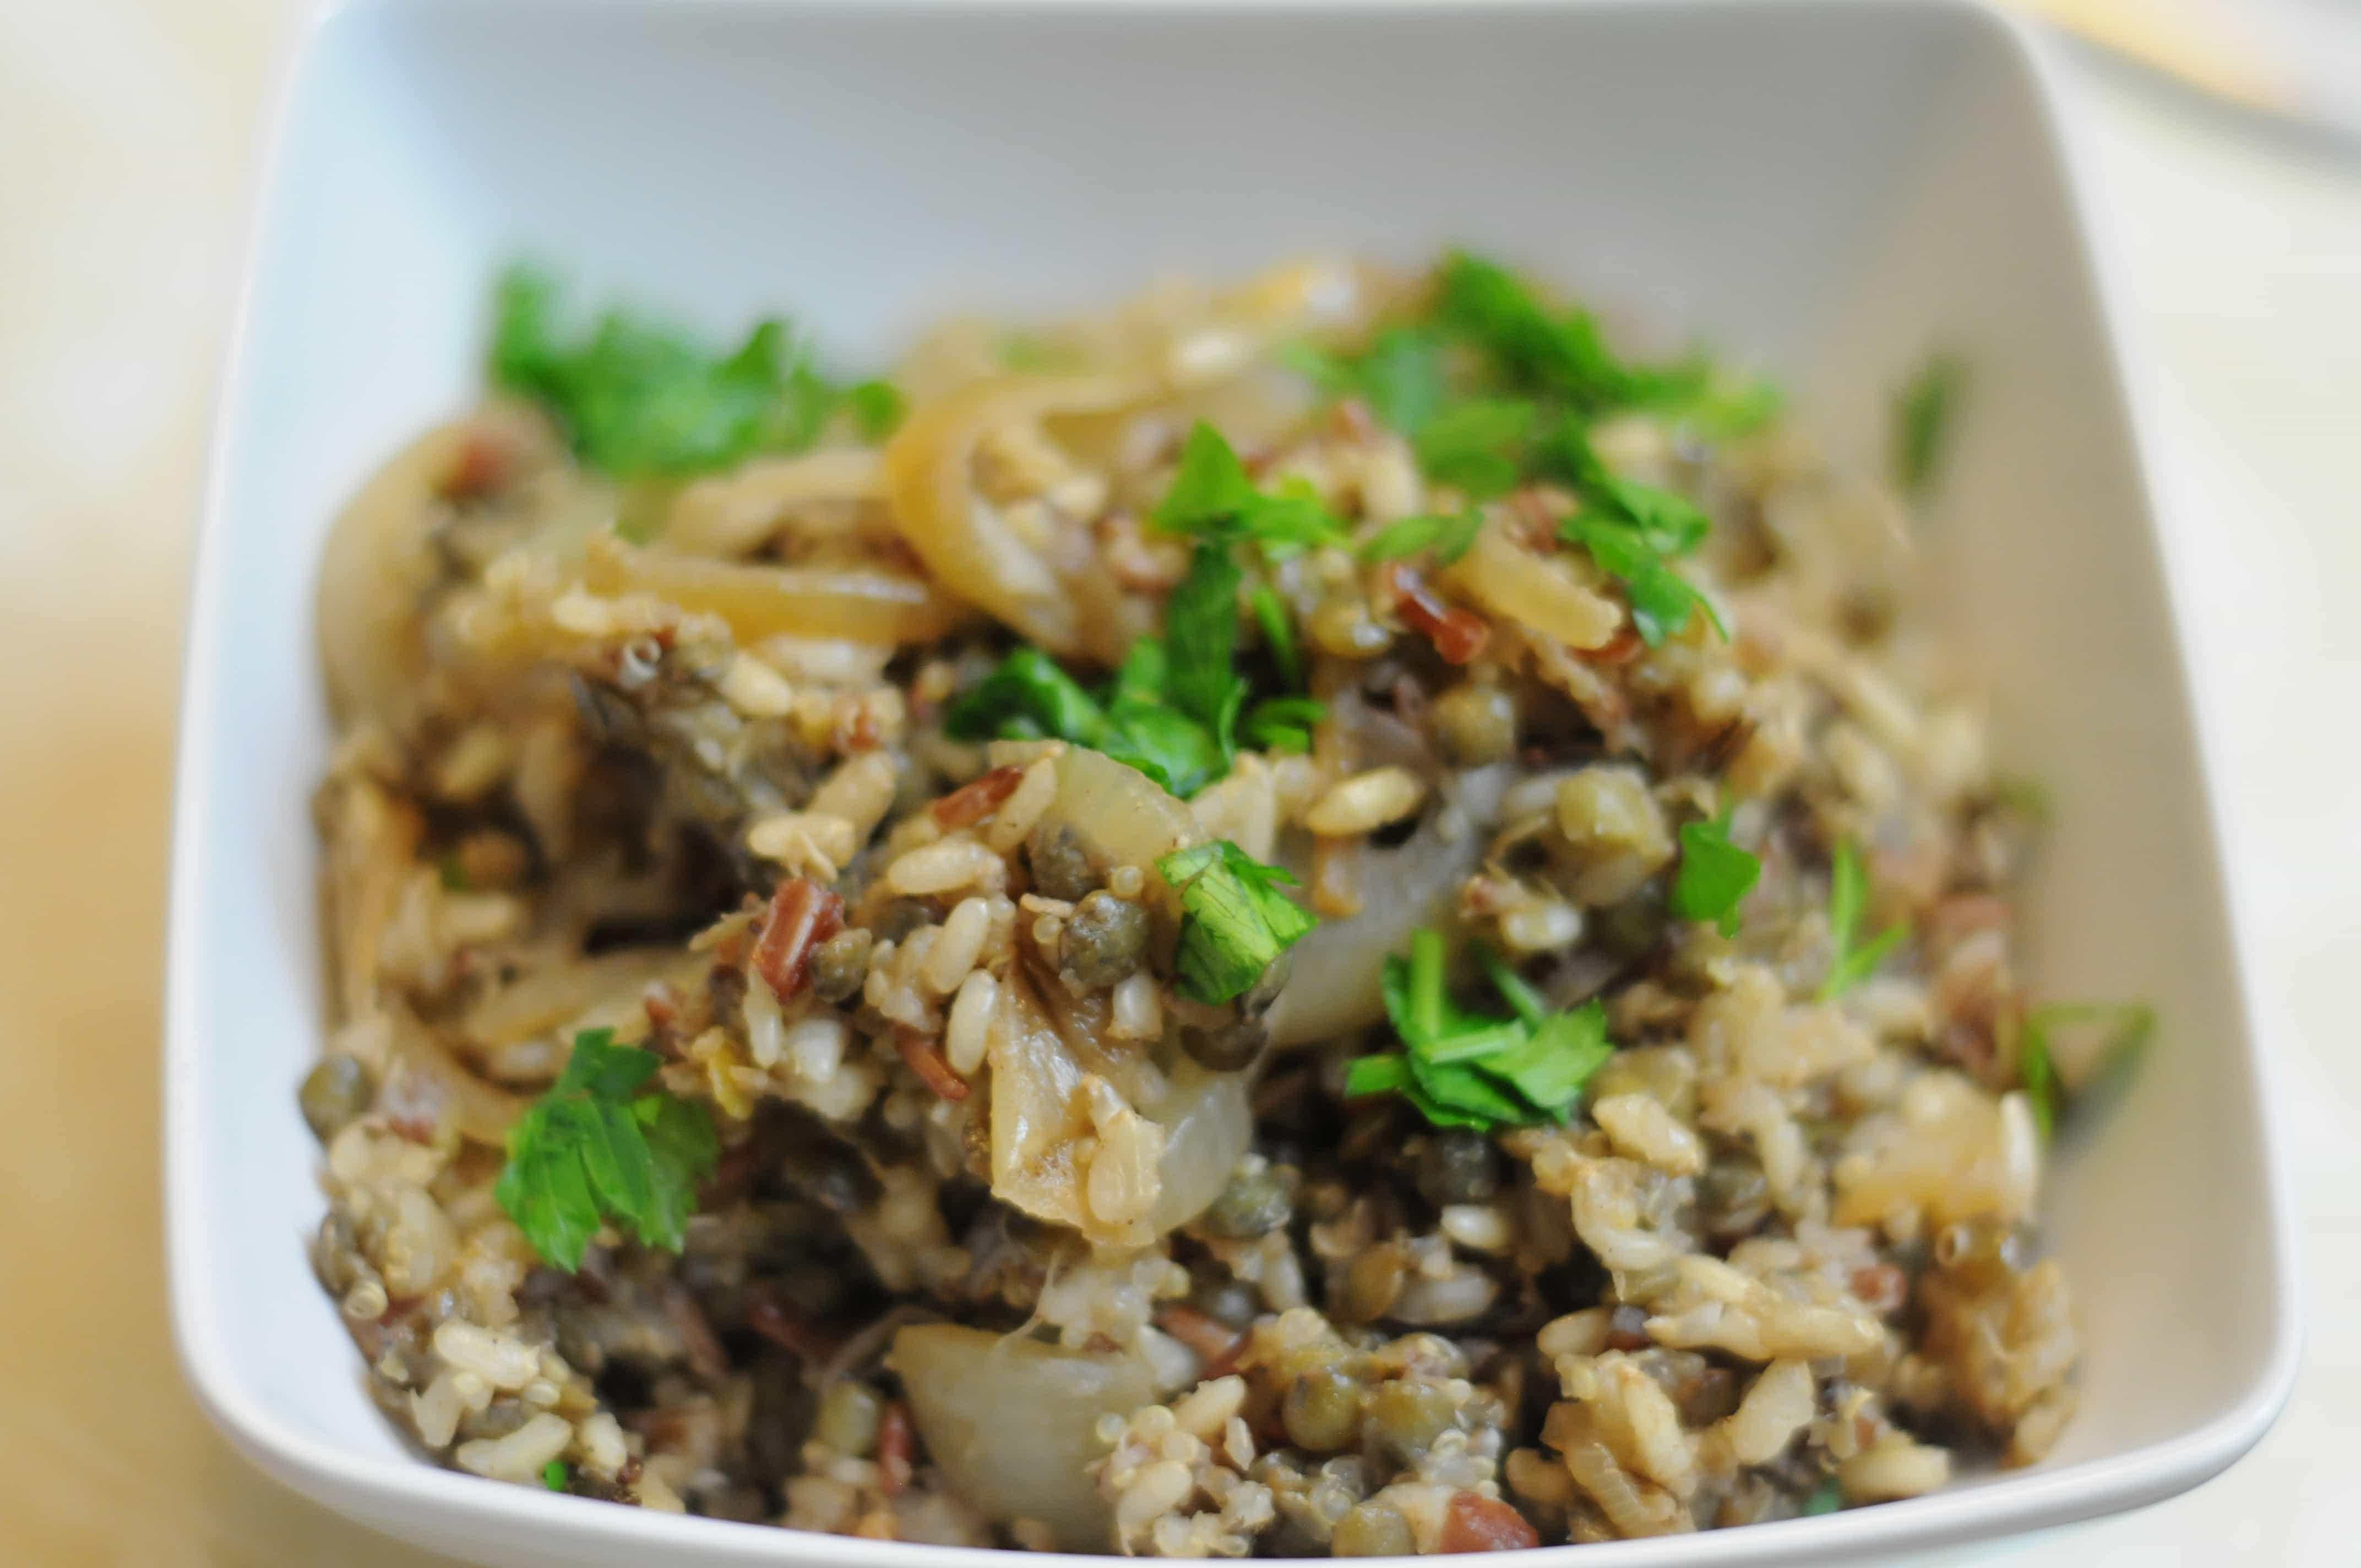 Middle Eastern Rice Pilaf Recipes  DSC 4633 Fried Dandelions